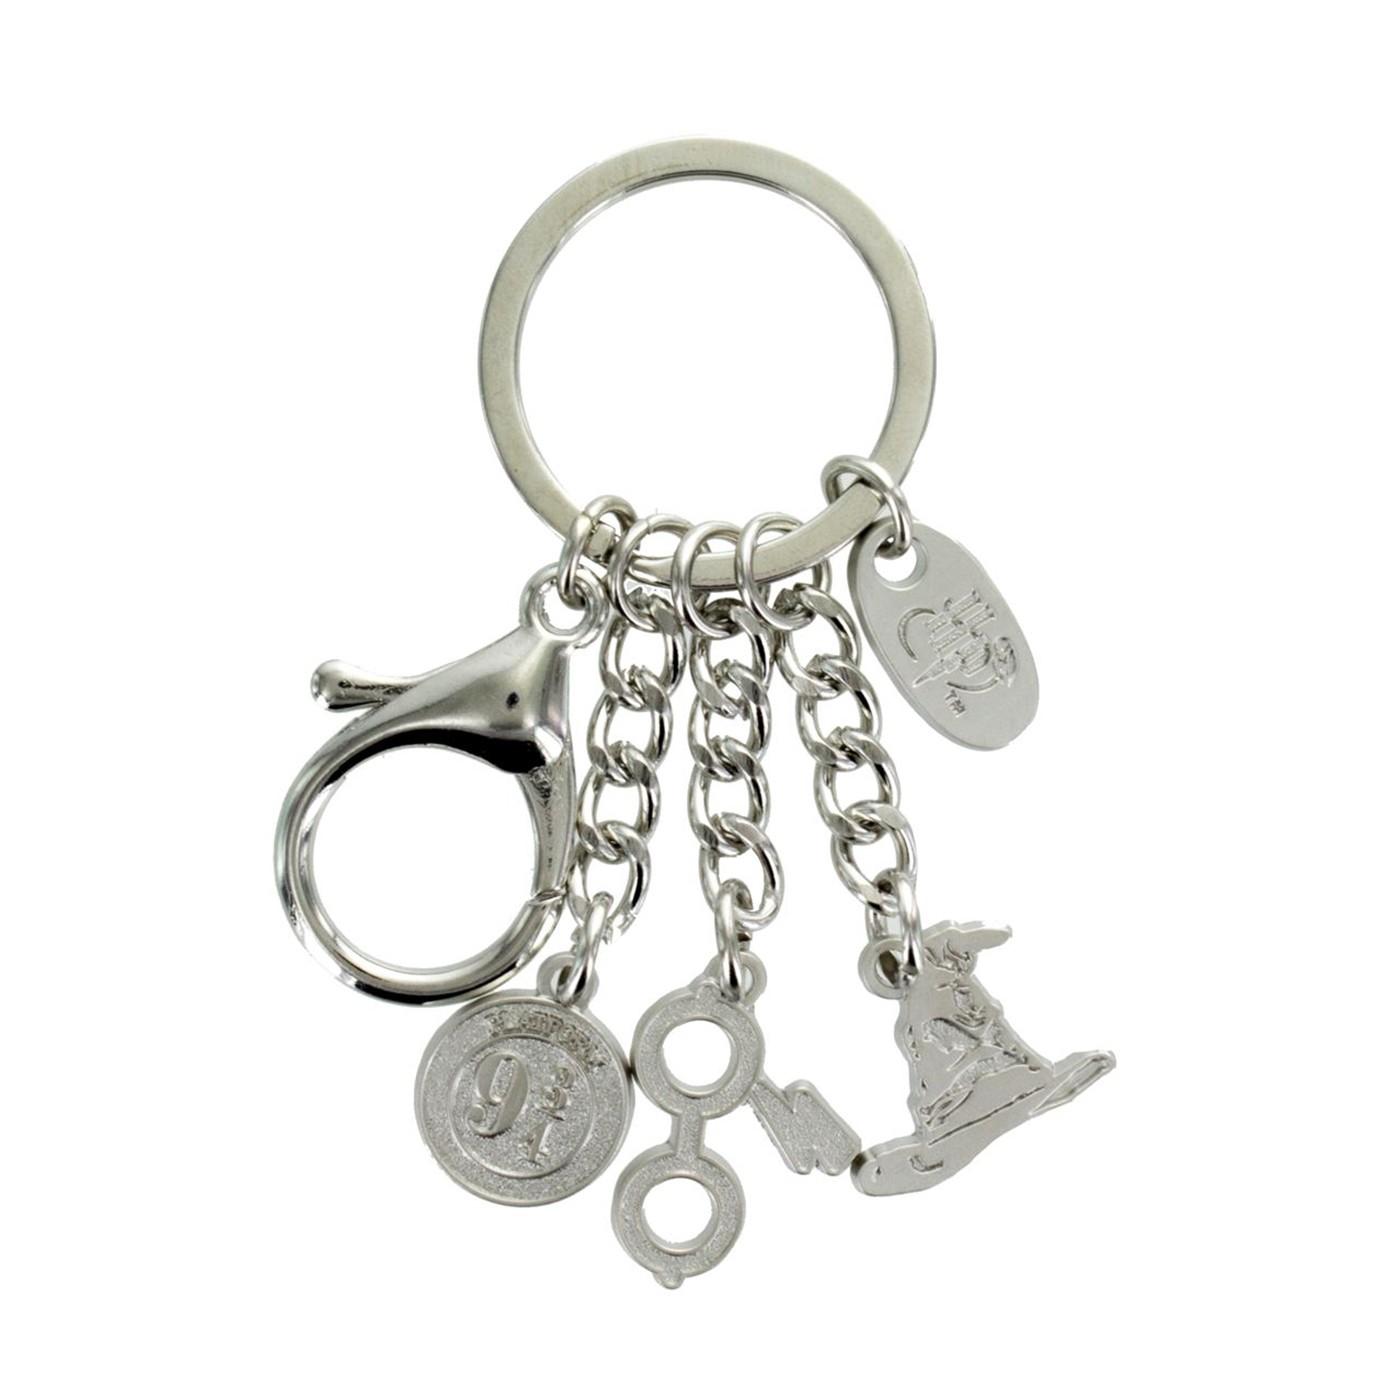 Harry Potter Charm Keychain